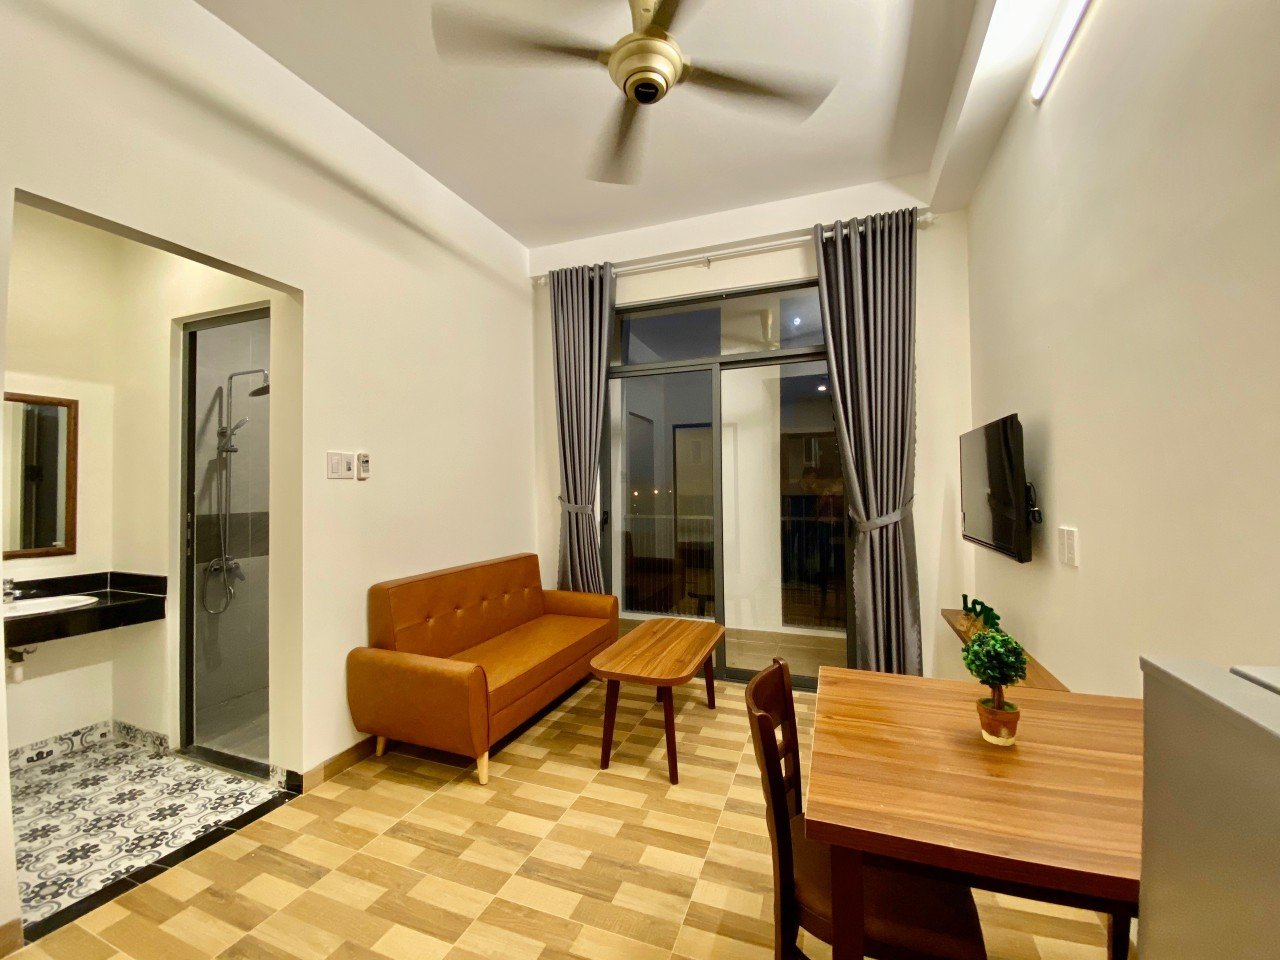 1 bedroom apartment for rent close to the beach Da Nang